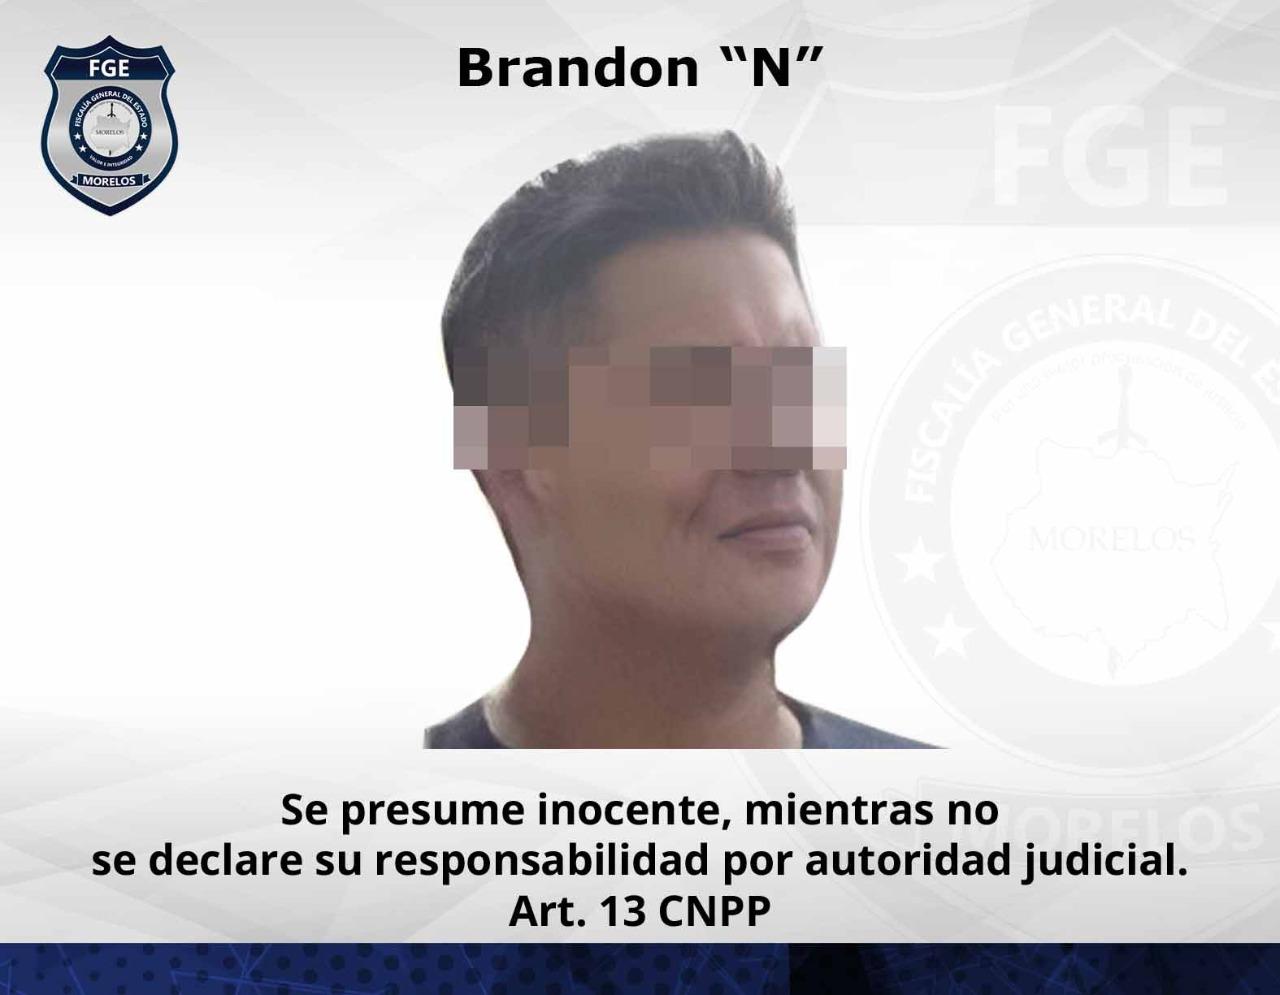 BRANDON N